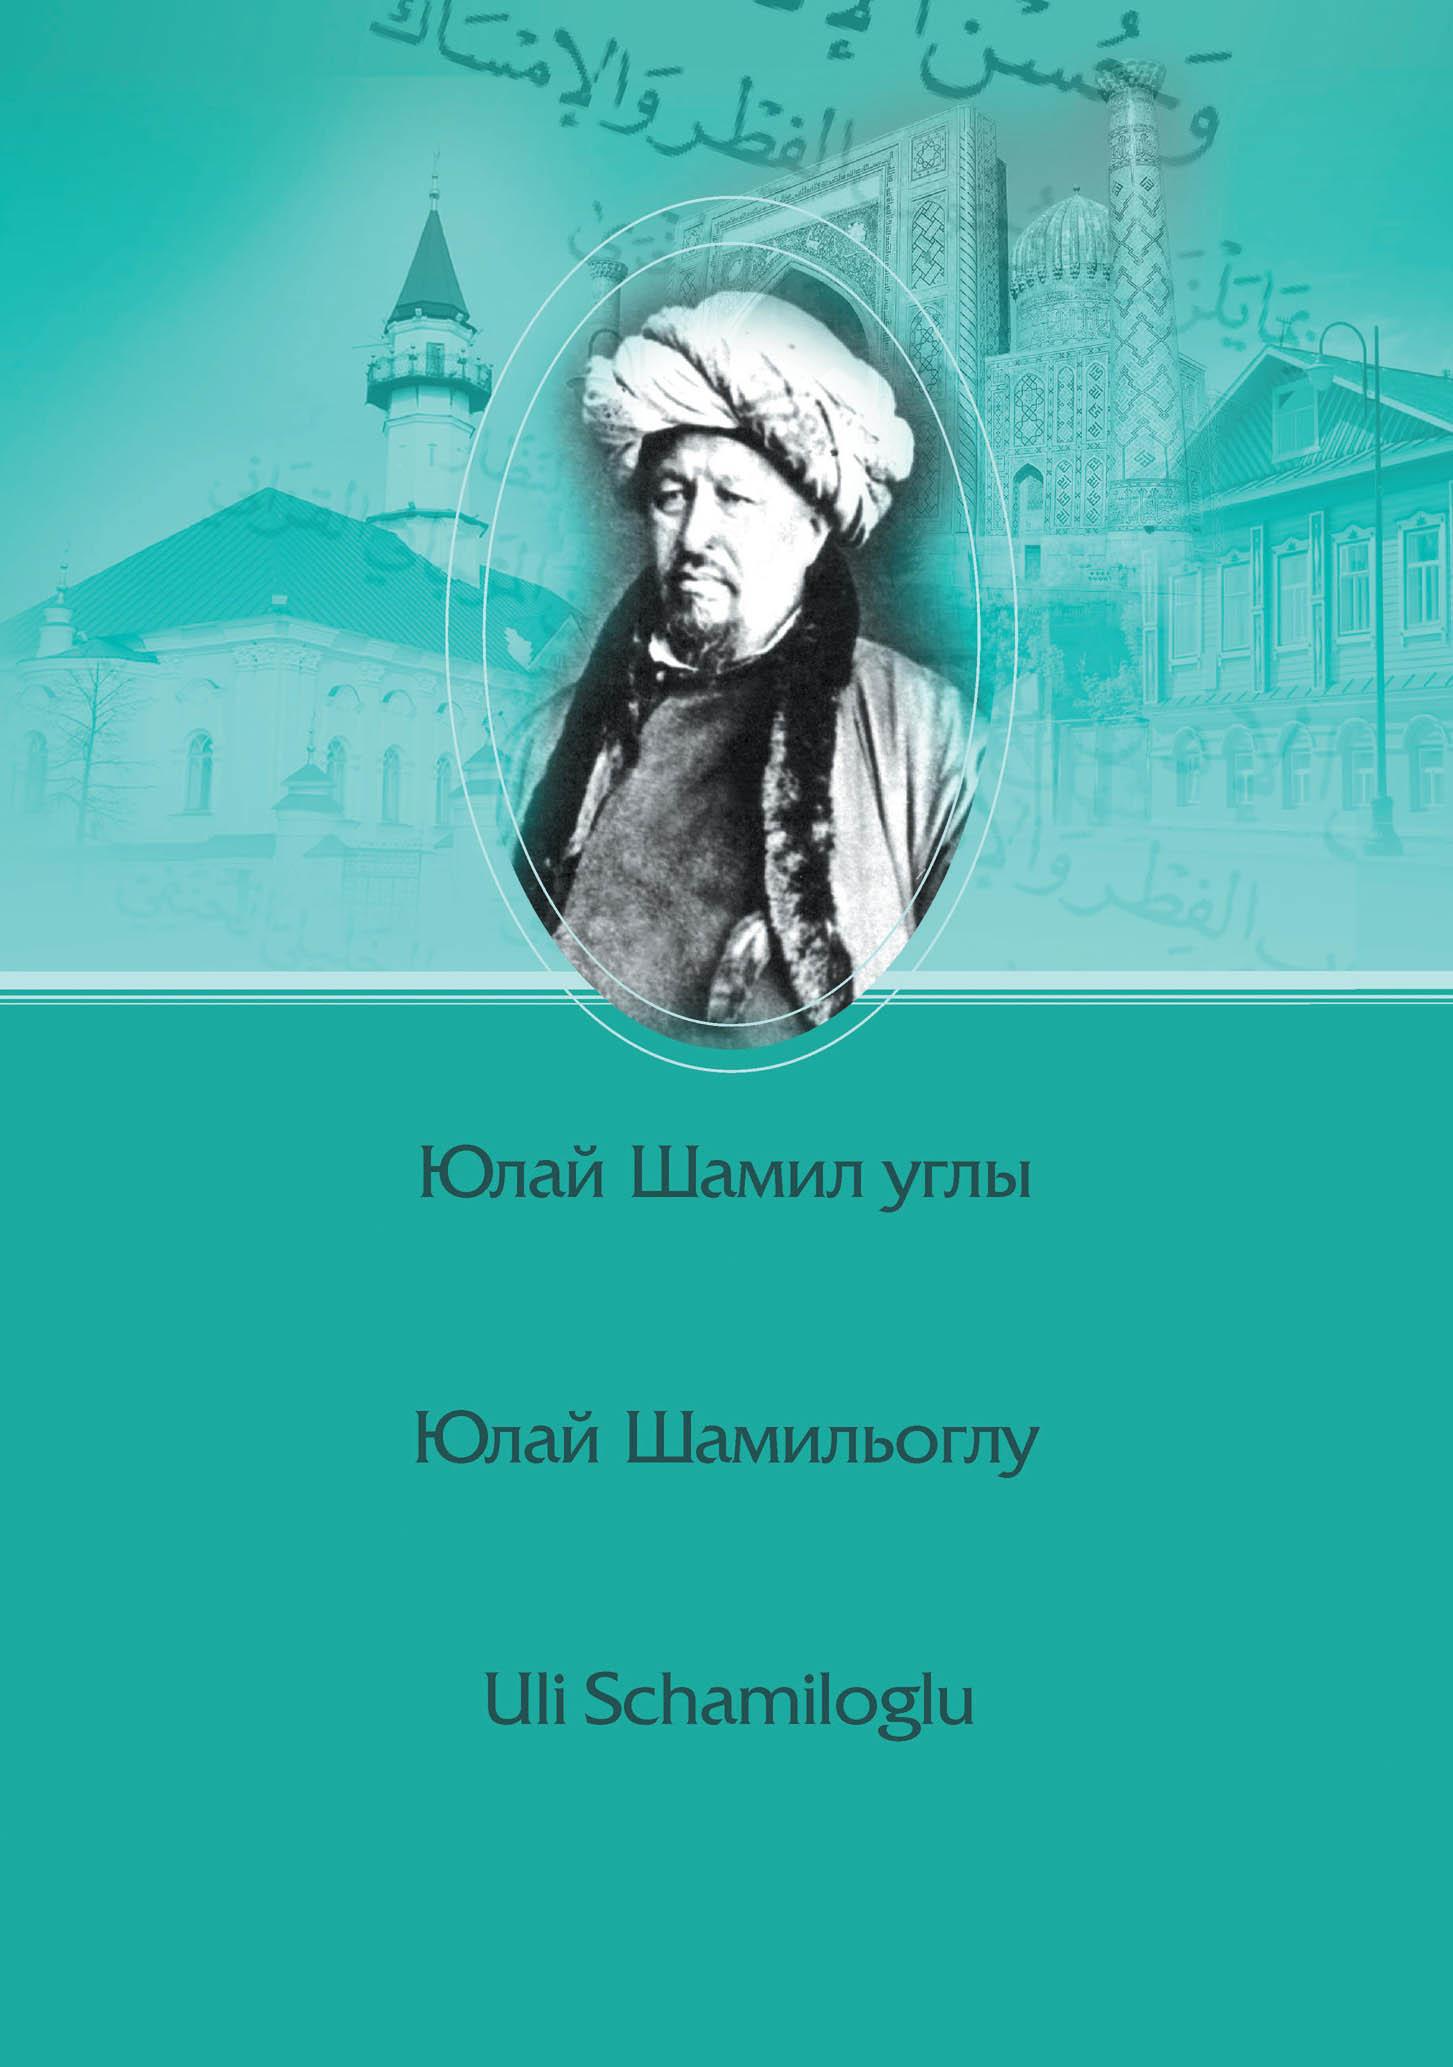 Юлай Шамильоглу Шиһабетдин Мәрҗани / Шигабутдин Марджани / Şihabeddin Märcani книги в формате txt скачать